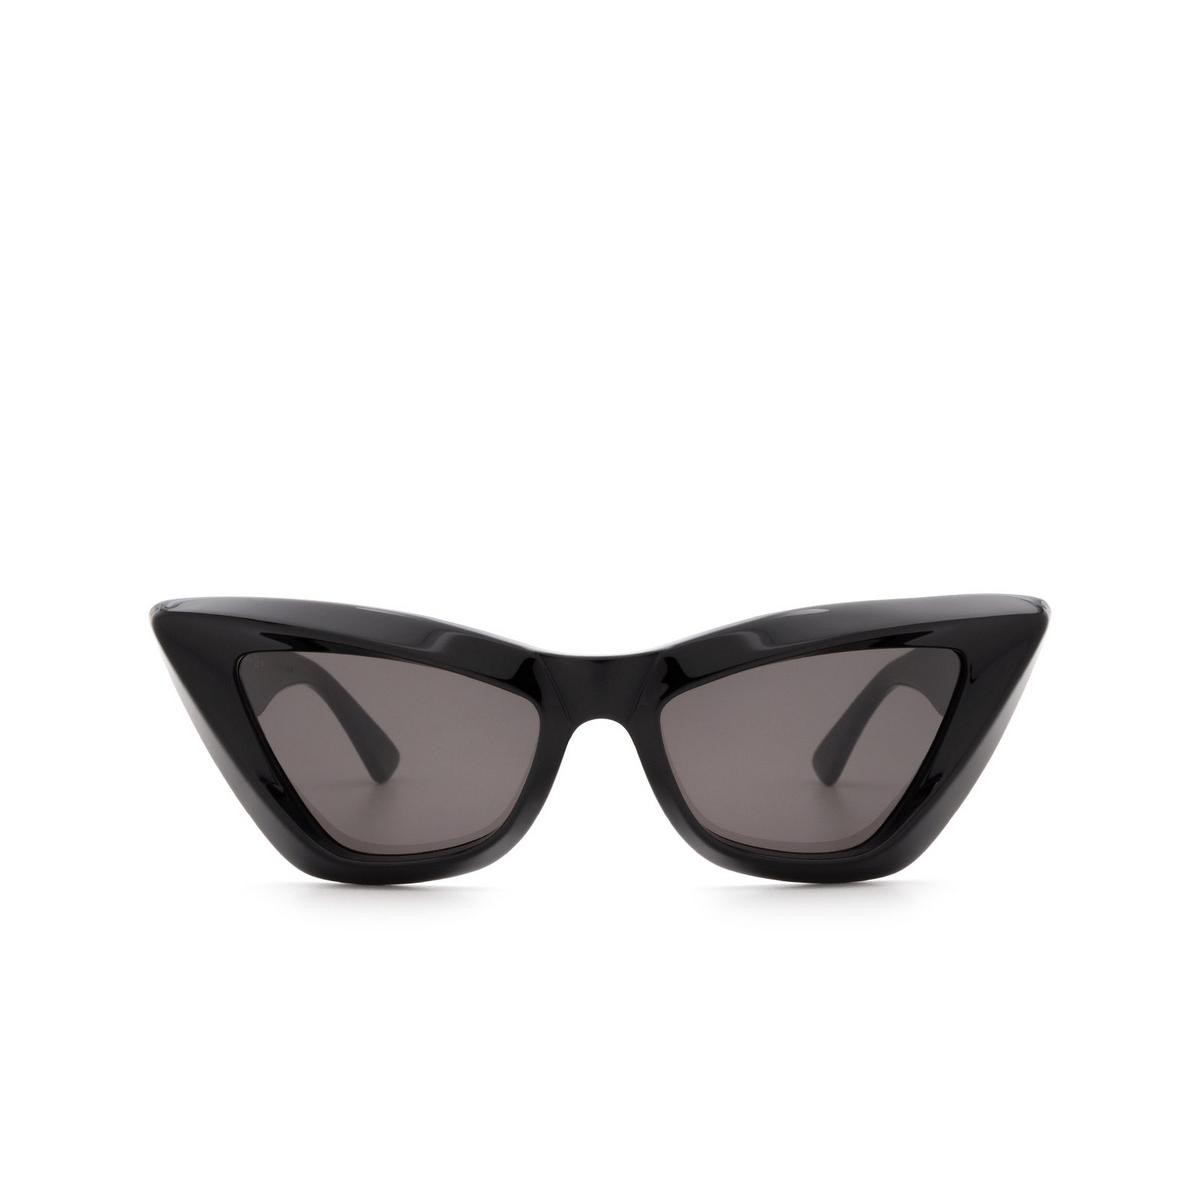 Bottega Veneta® Cat-eye Sunglasses: BV1101S color Black 001 - front view.